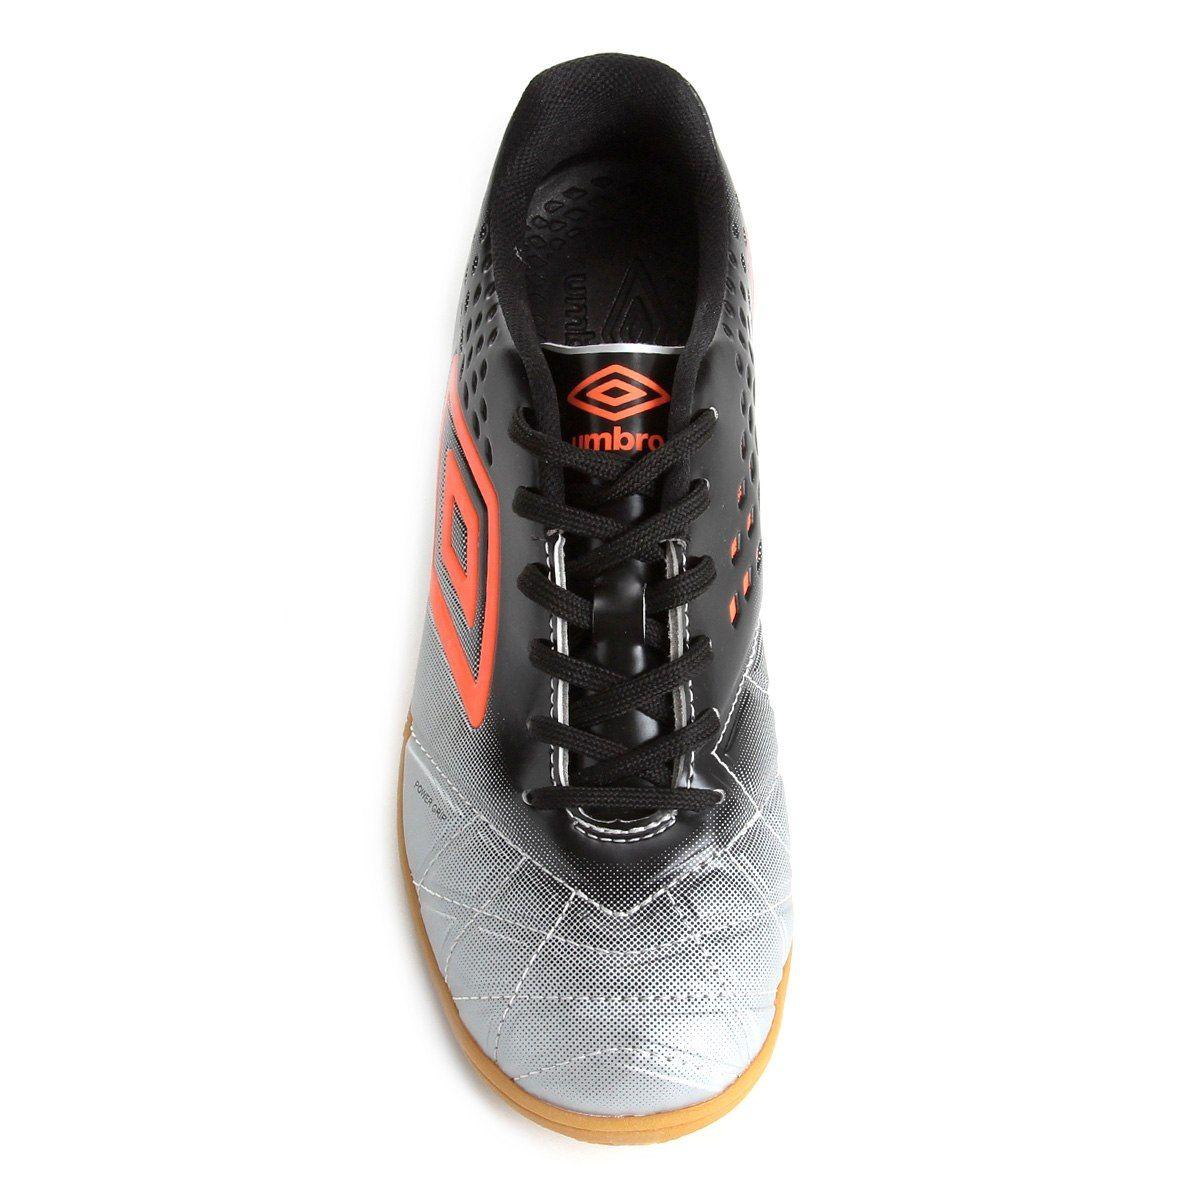 Tenis Umbro Fifty Pro Futsal 0F72093-816  - Dozze Shoes